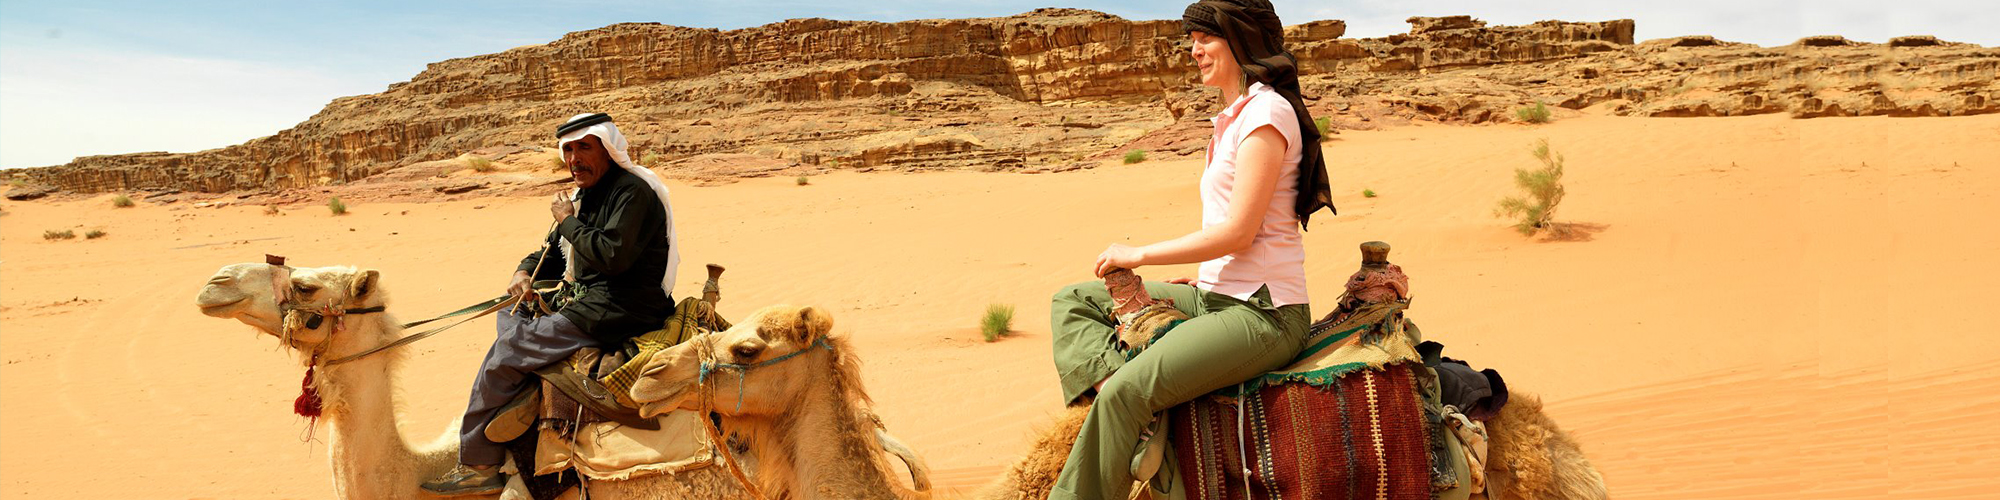 El Gouna Safari Trips - Safari Tours in El Gouna - El Gouna Excursions - Tours From Hurghada